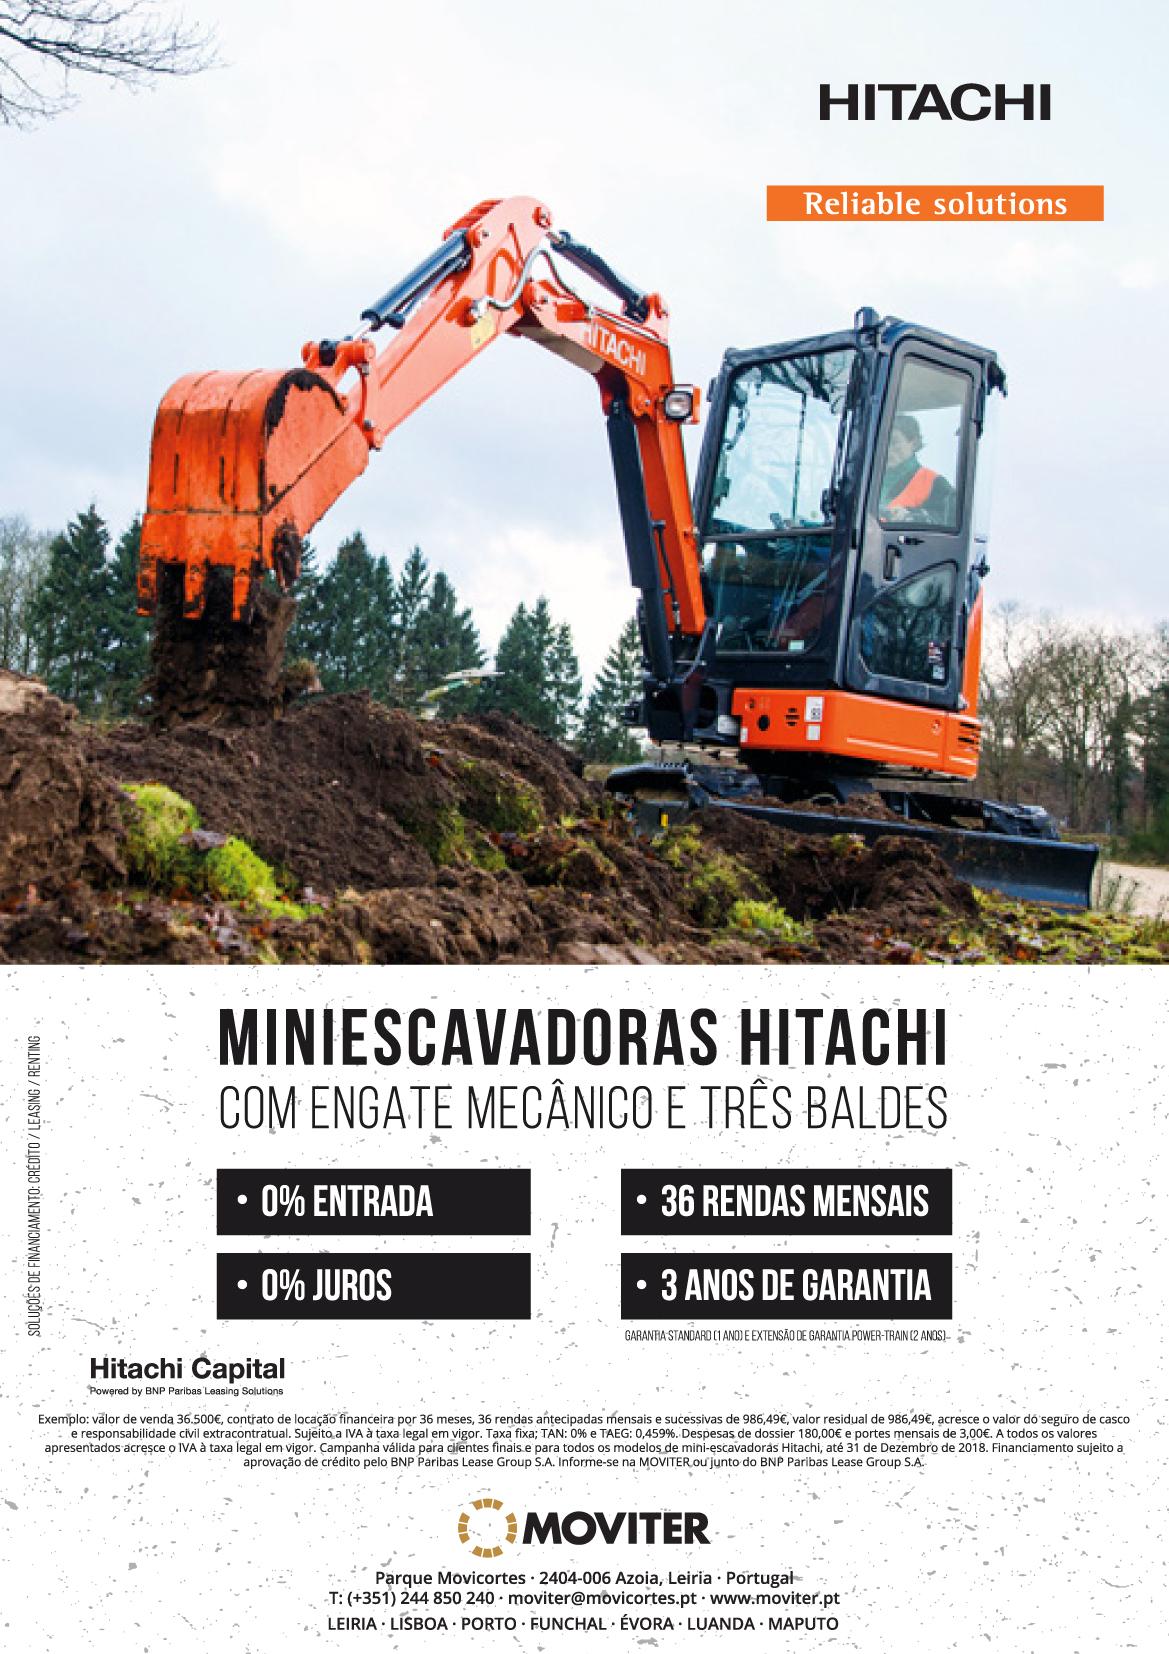 Hitachi_Mini escavadoras Moviter_2018